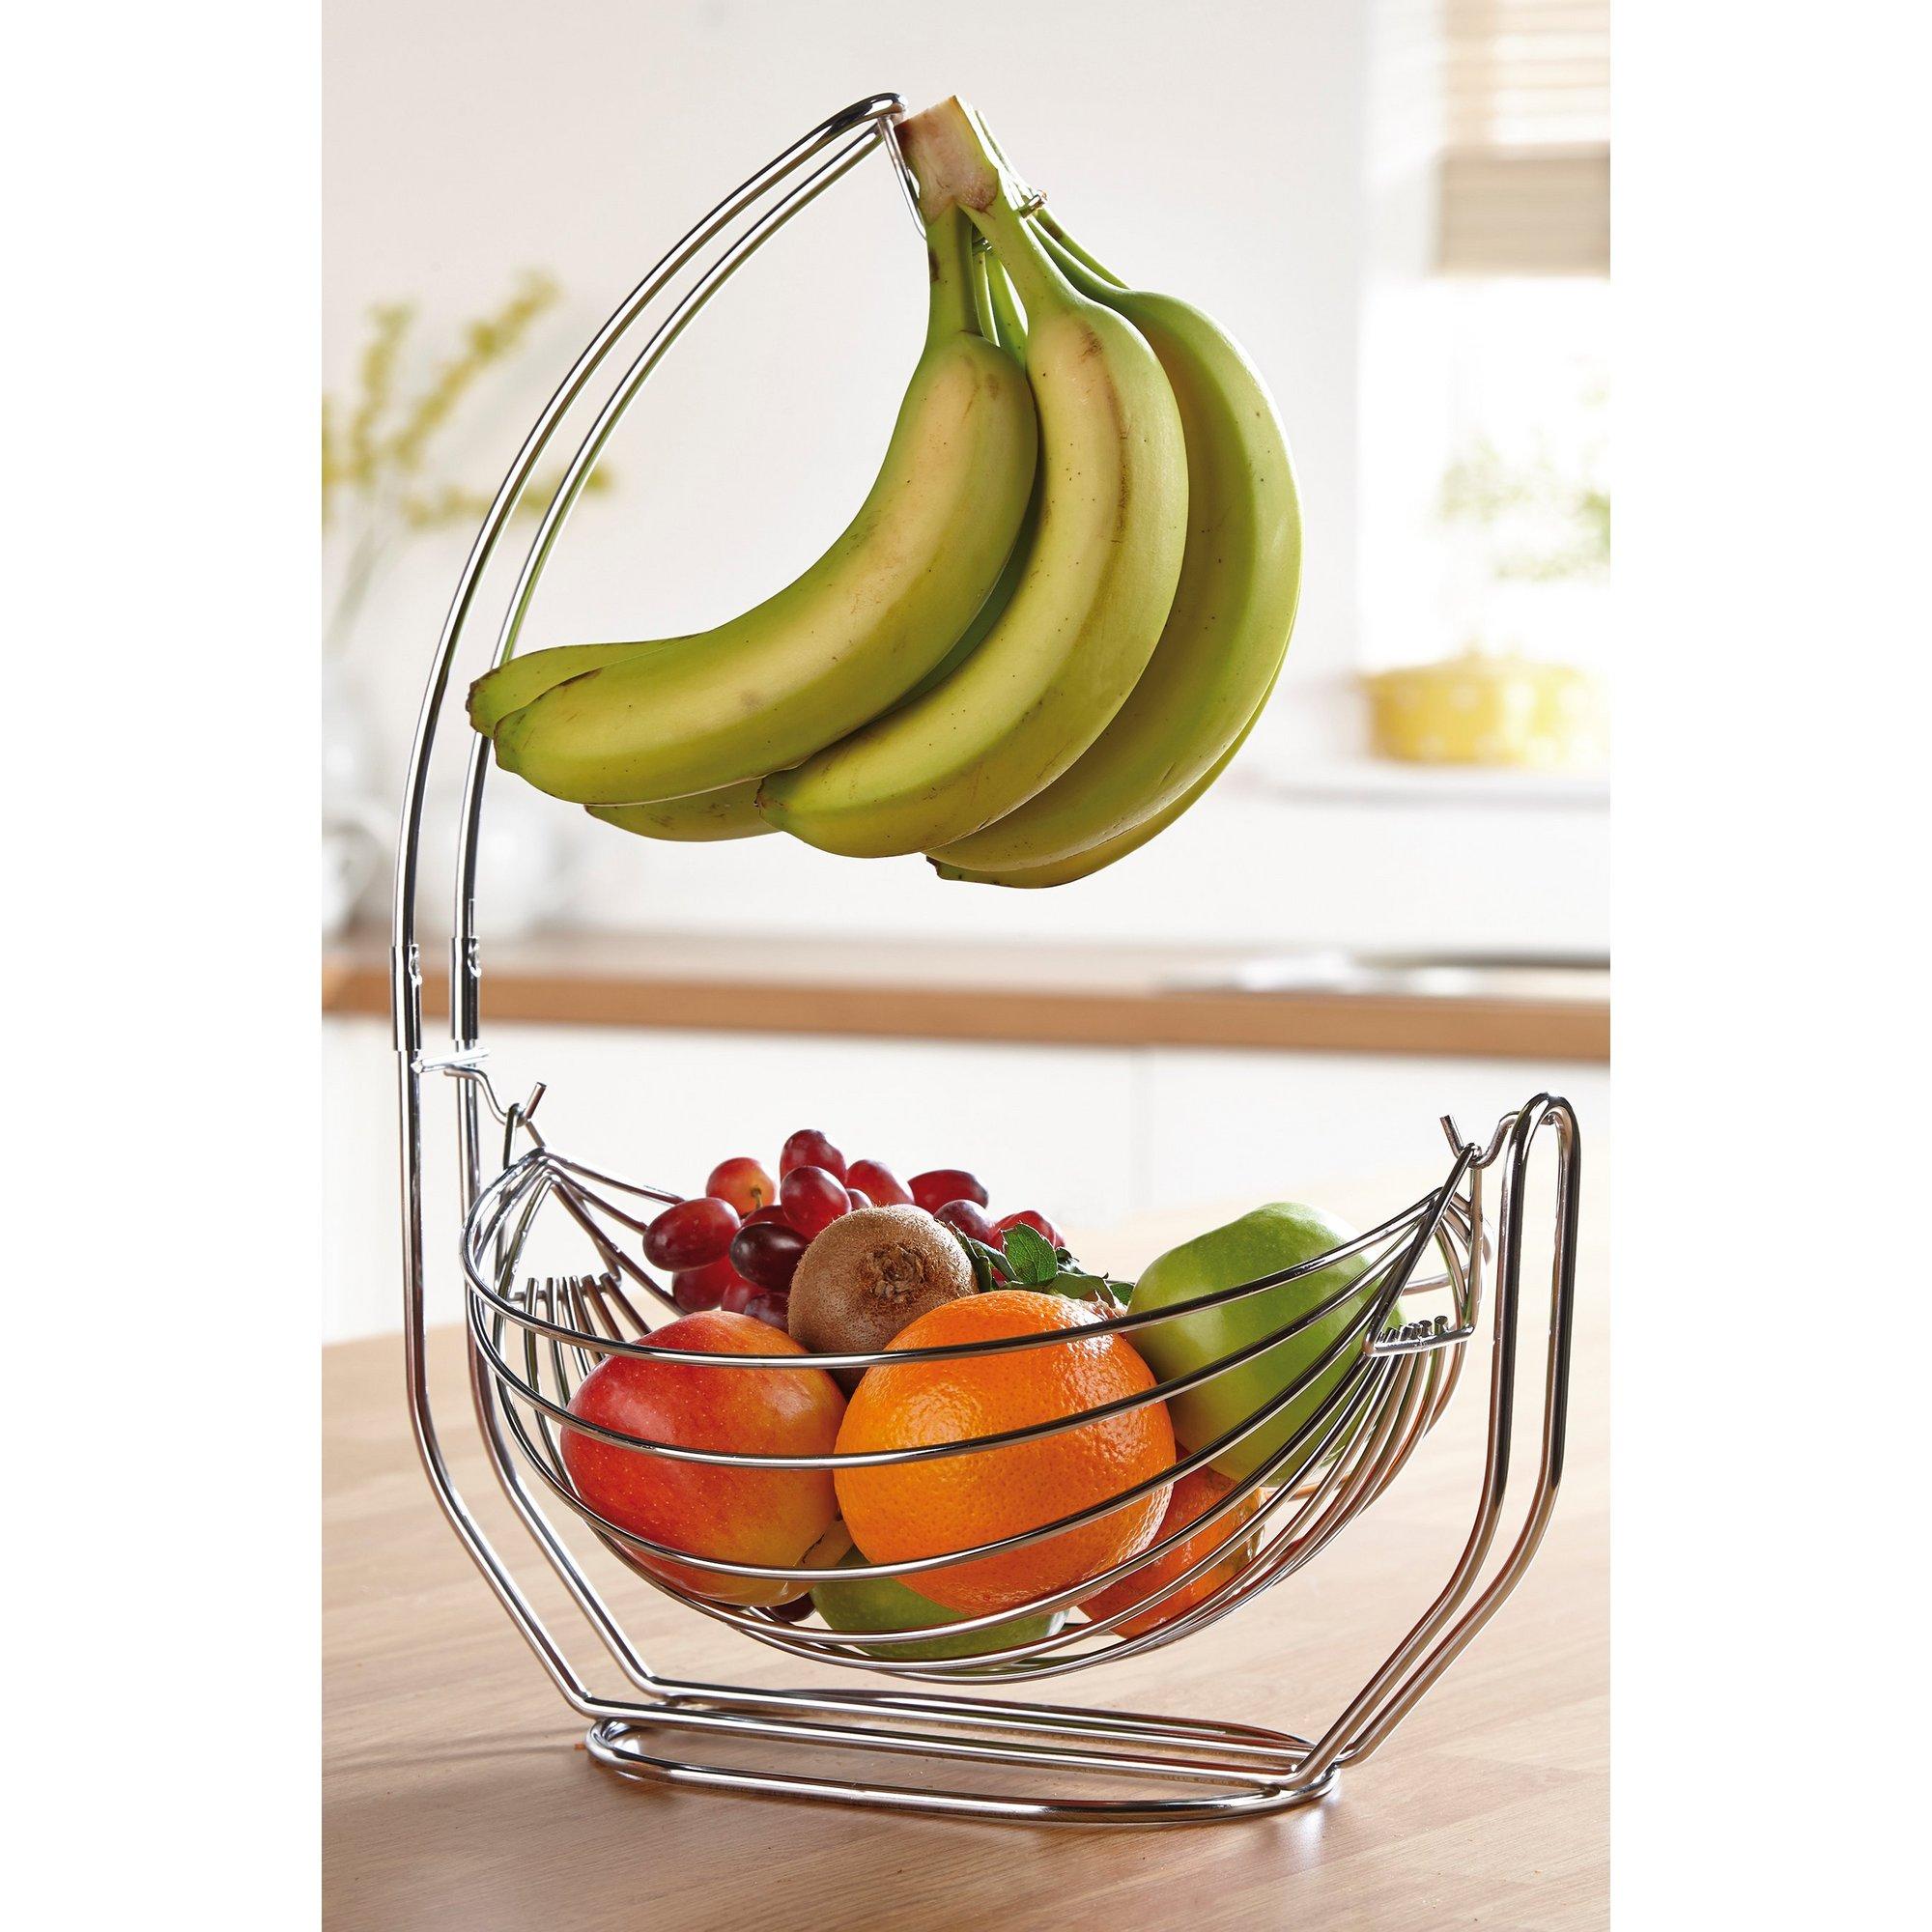 Image of Fruit Basket with Banana Hanger